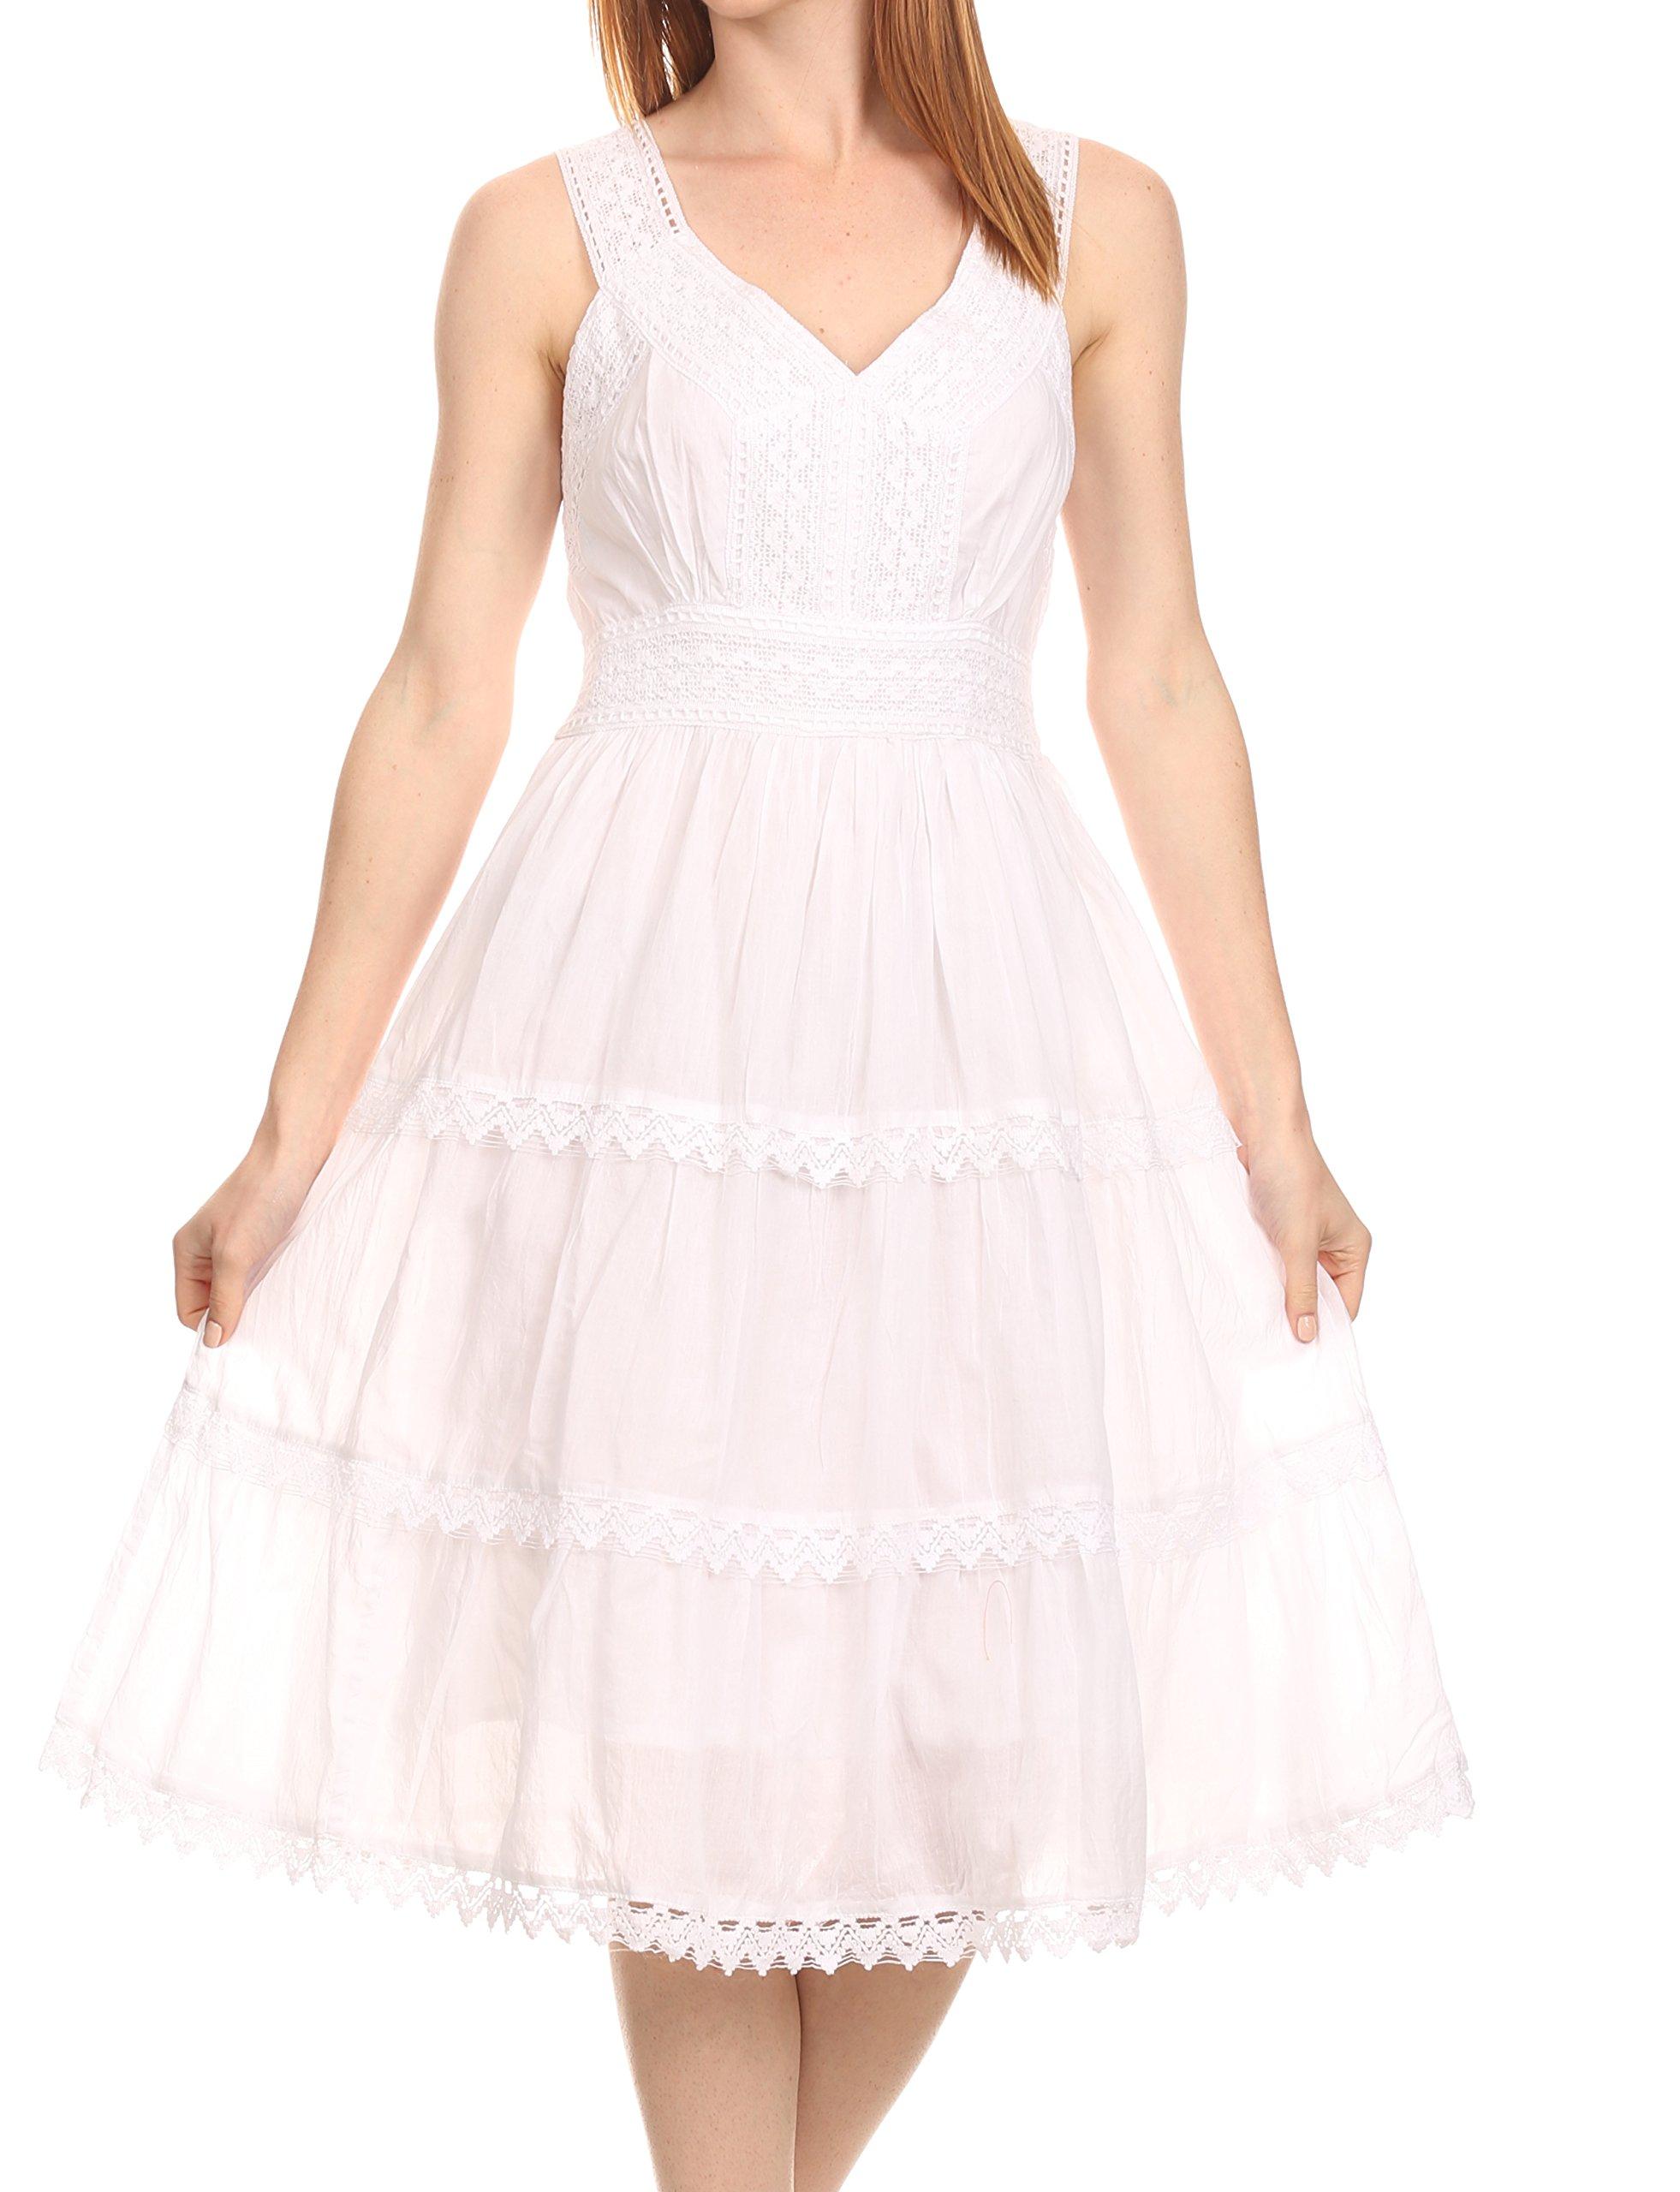 Sakkas KD2155 - Presta Roman Sleeveless Lined Tank Top Dress with Emrboidery Lace Design - White - 1X